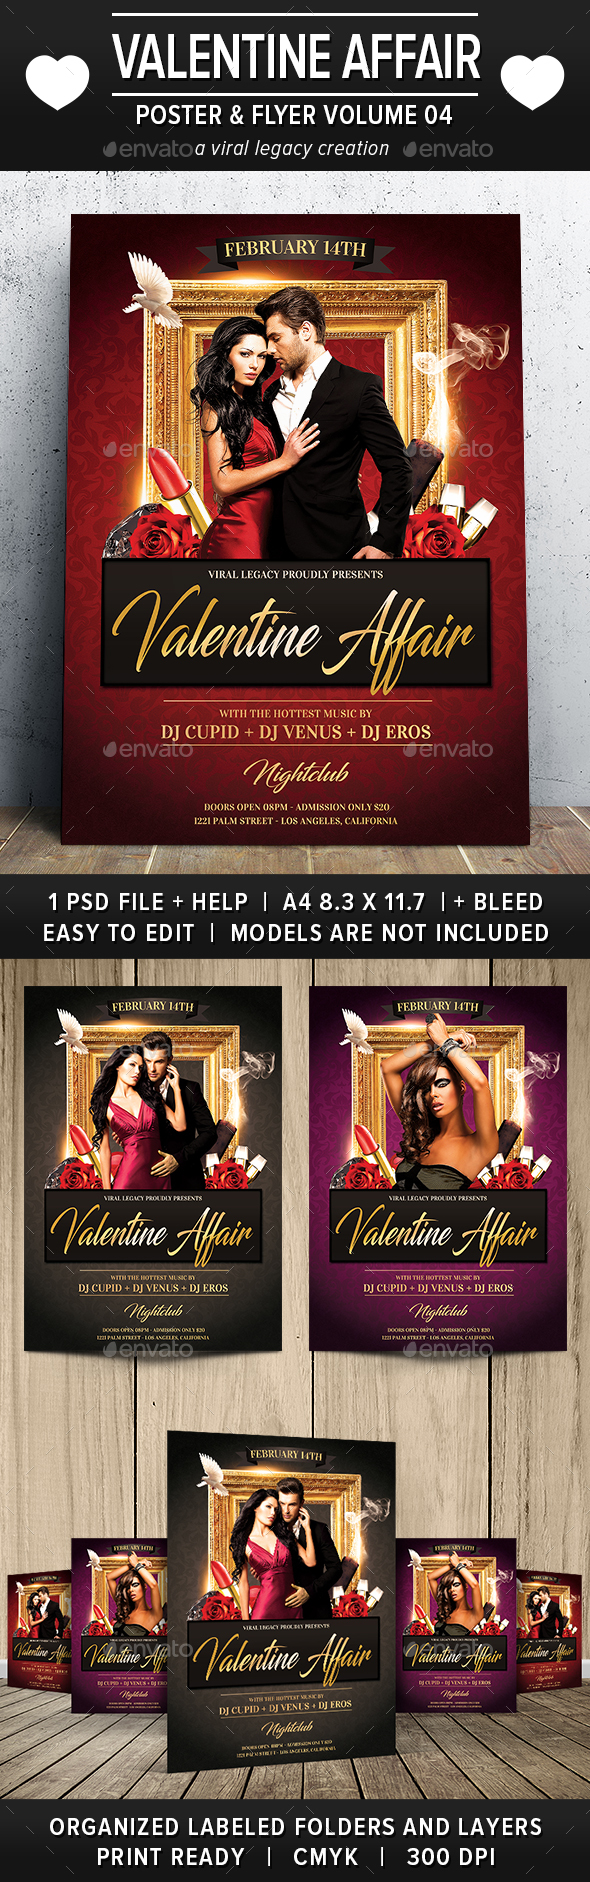 Valentine Affair Poster / Flyer V04 - Flyers Print Templates